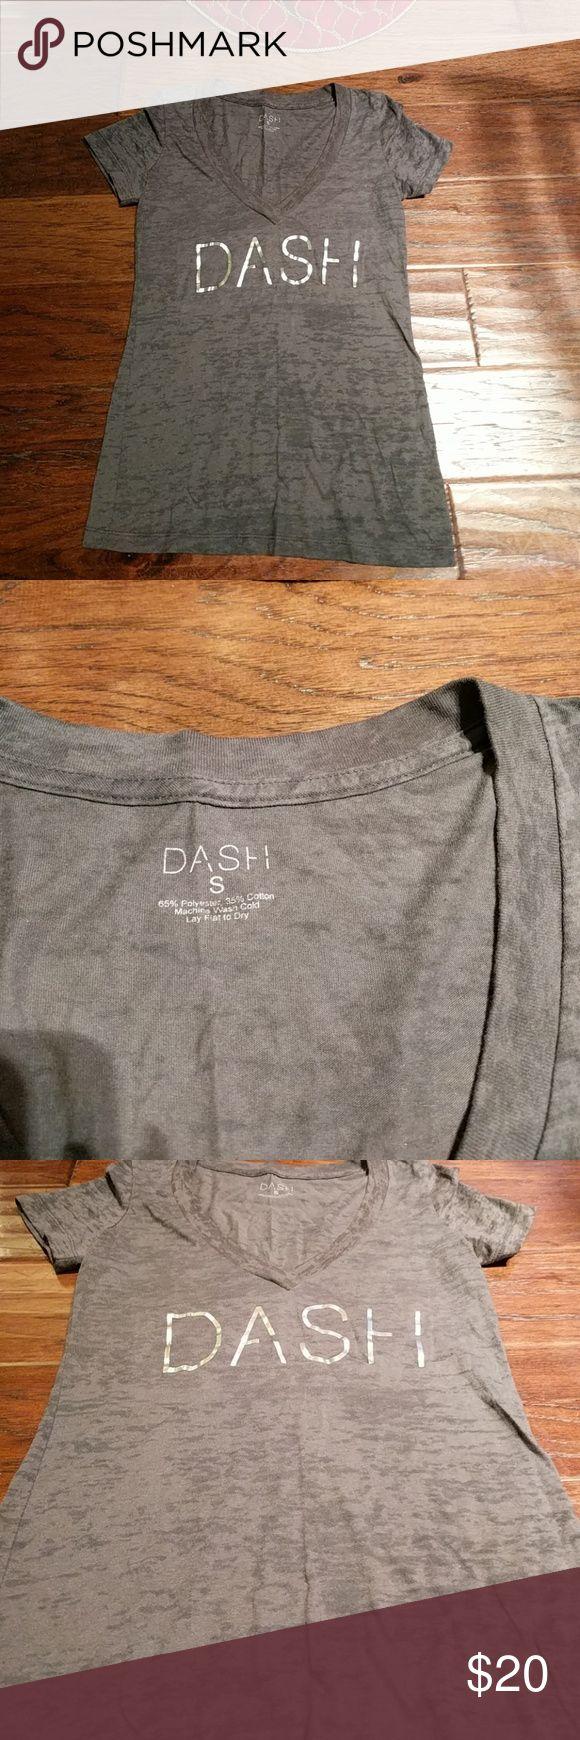 Kardashian store shirt size small DASH Kardashian store Dash shirt small dash Tops Tees - Short Sleeve